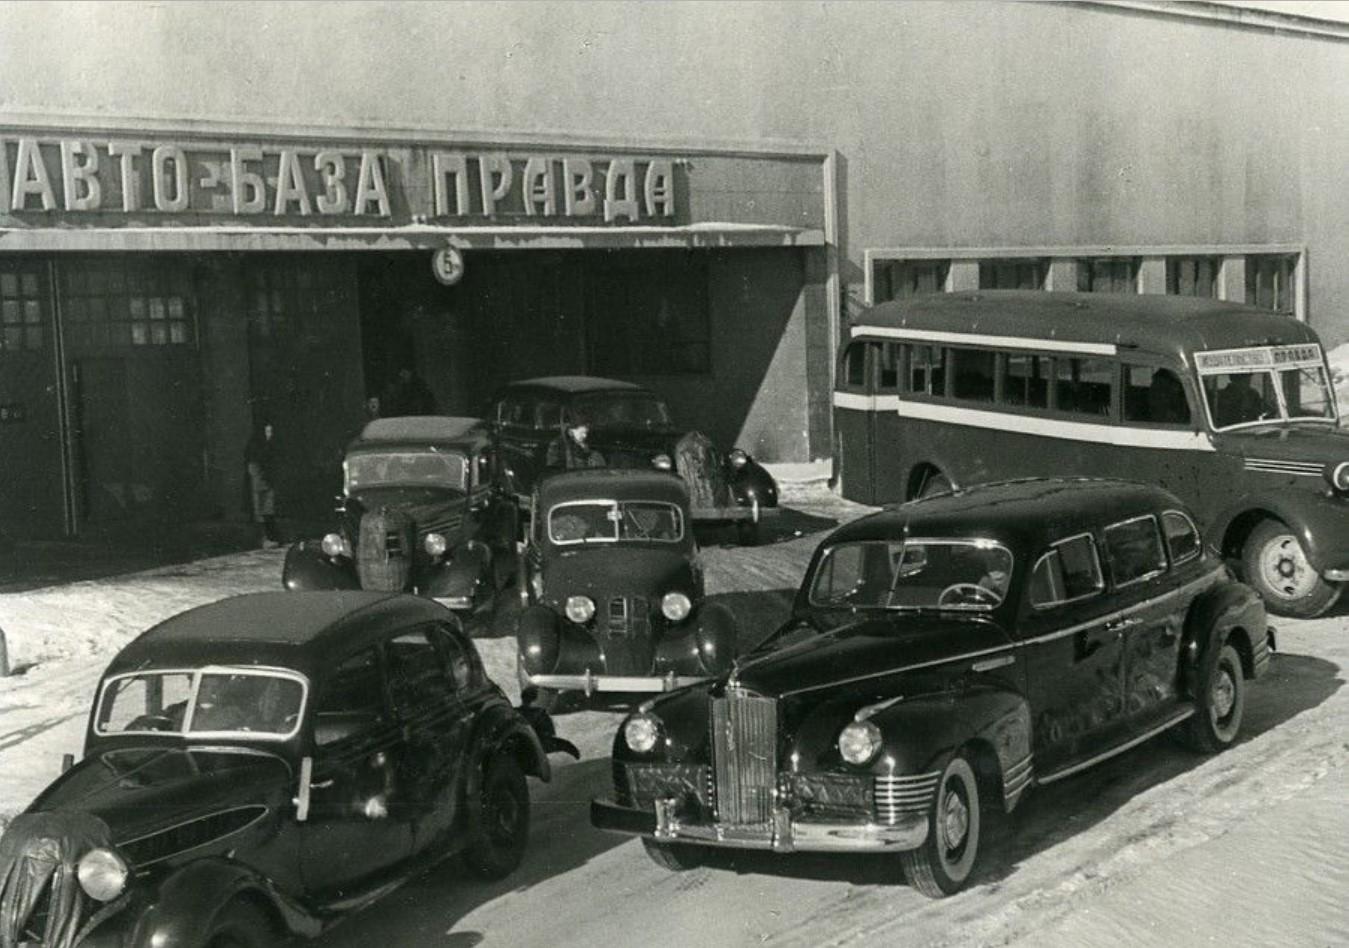 1947. Автобаза газеты Правда